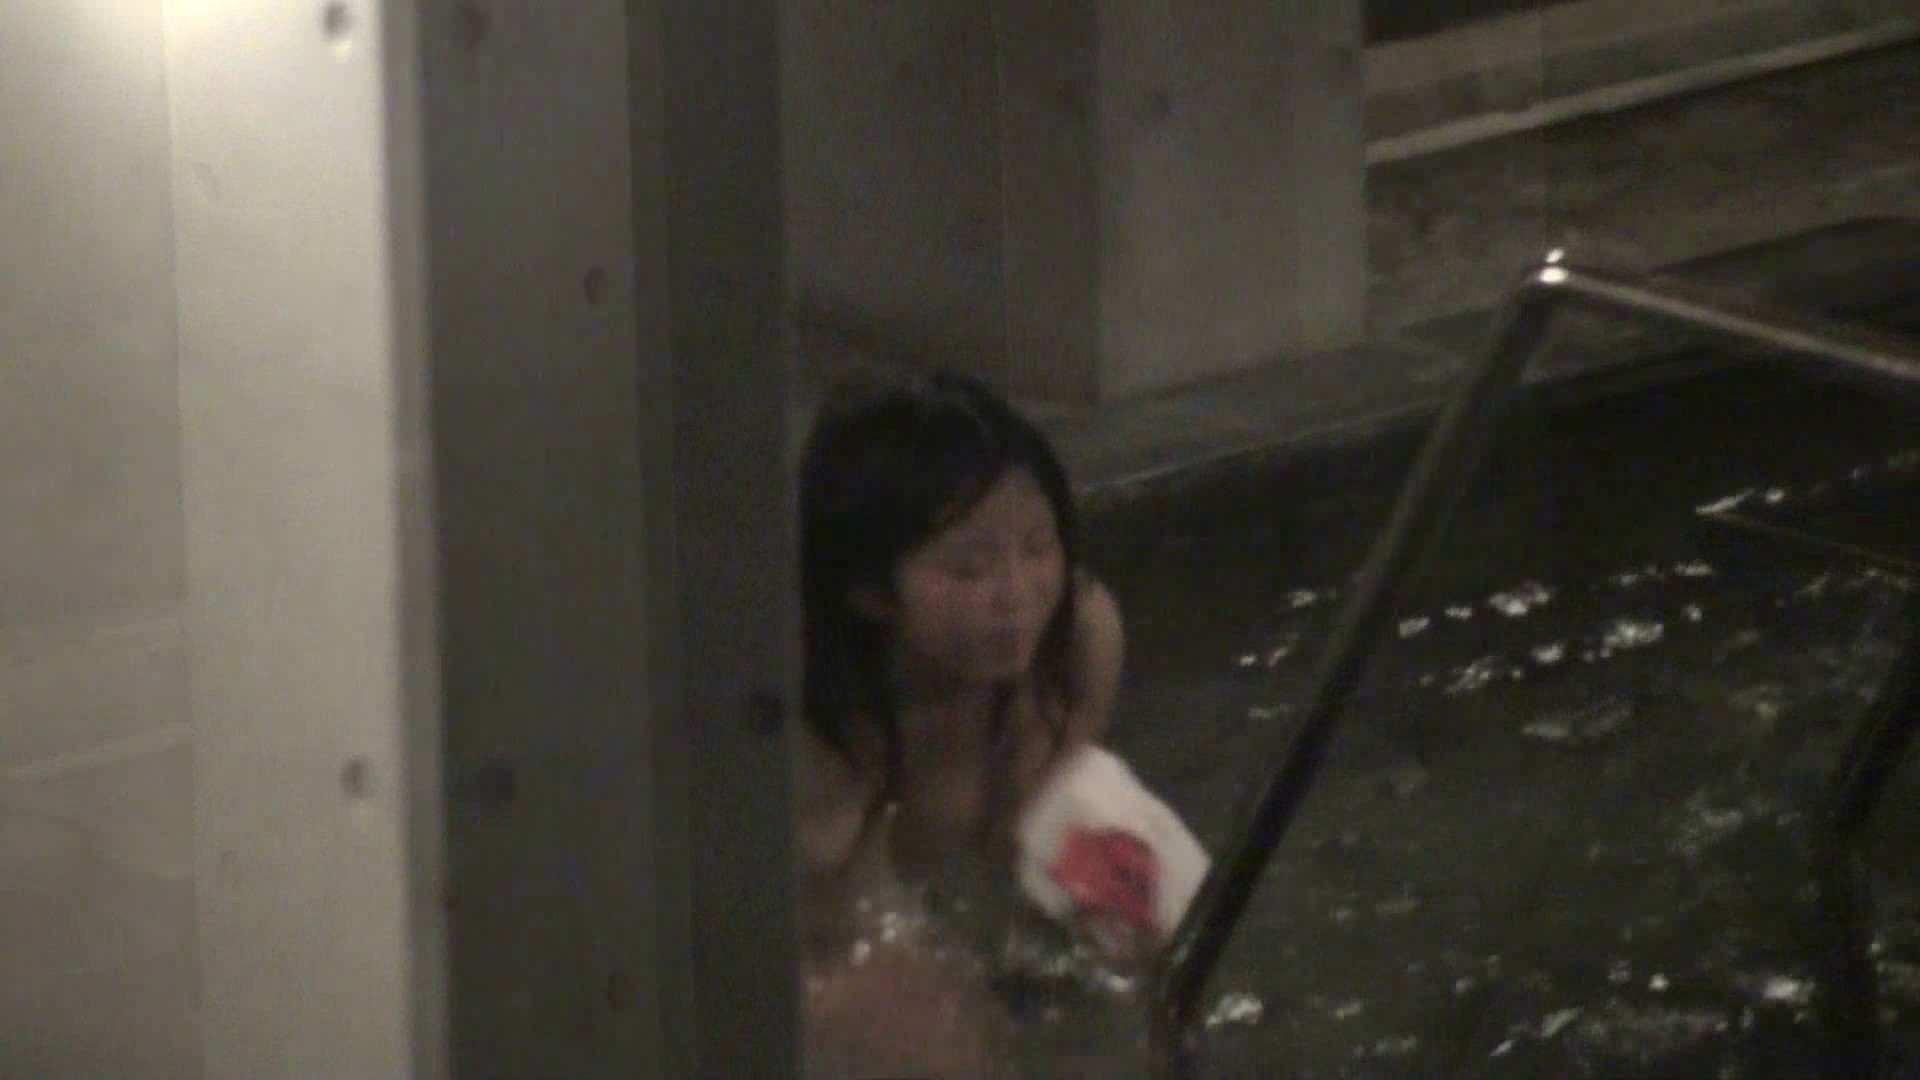 Aquaな露天風呂Vol.326 OLセックス  105画像 45